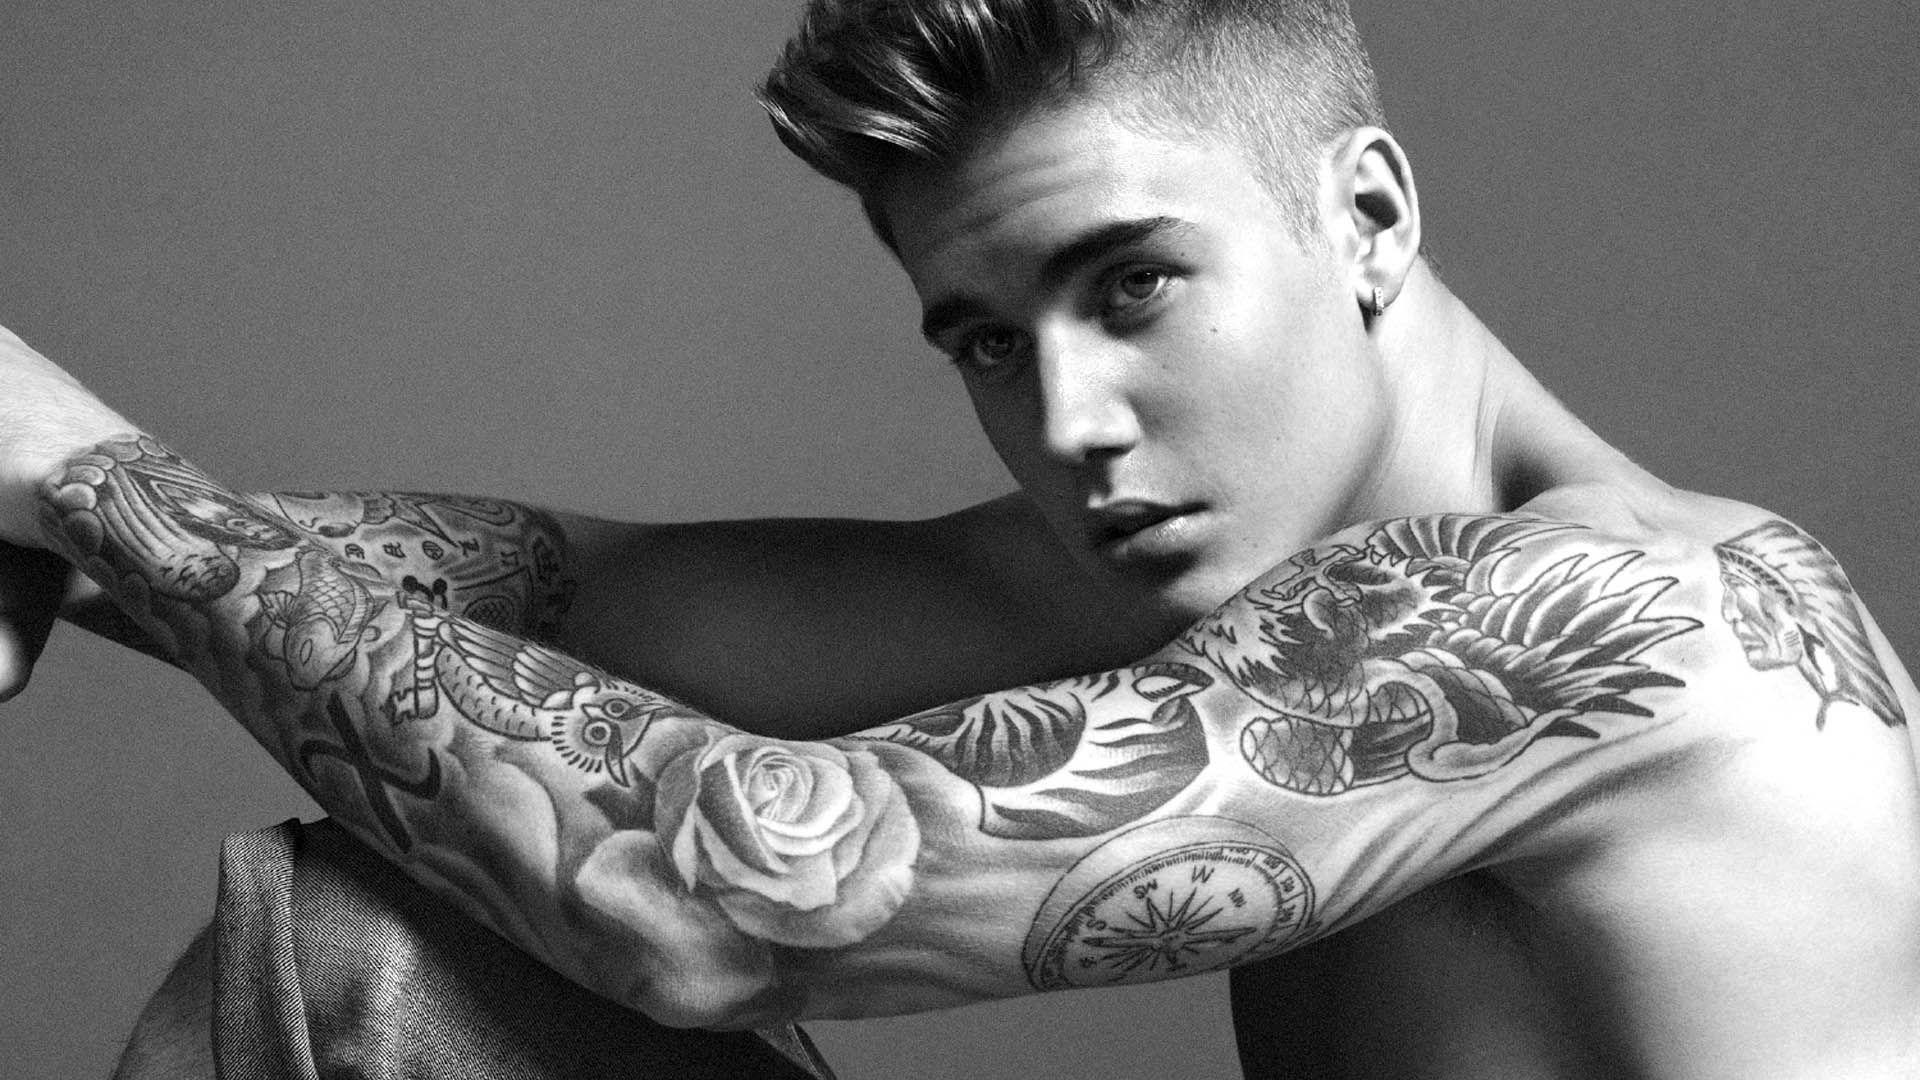 Justin Bieber Tumblr Backgrounds 16 Wallpaper Cave